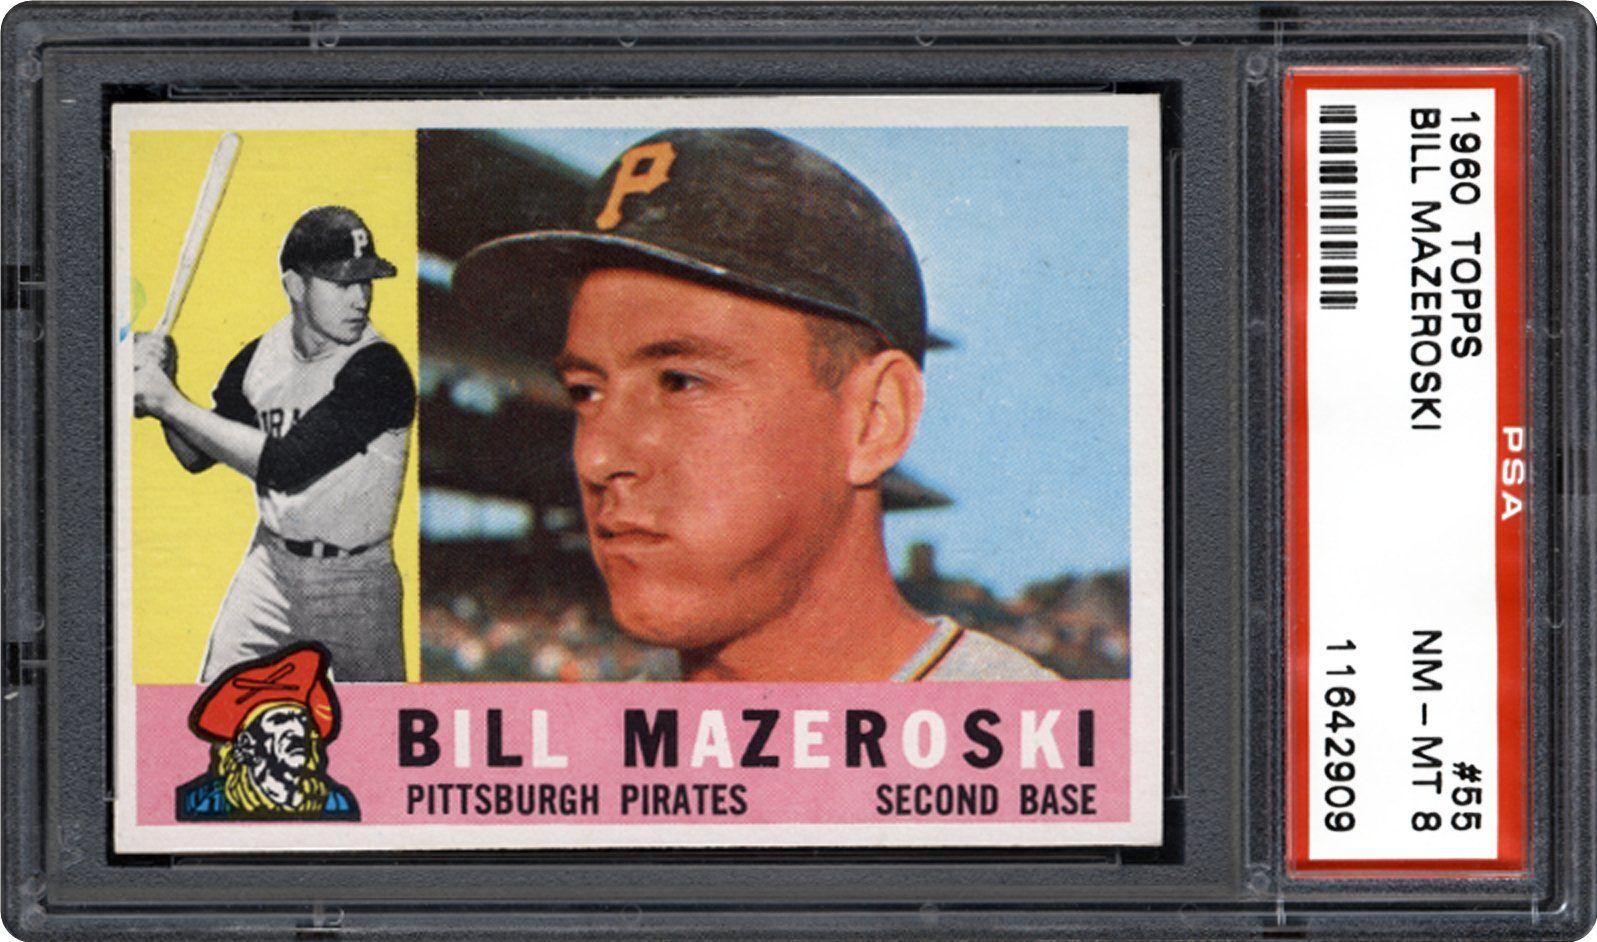 1960 Topps Bill Mazeroski Psa Cardfacts